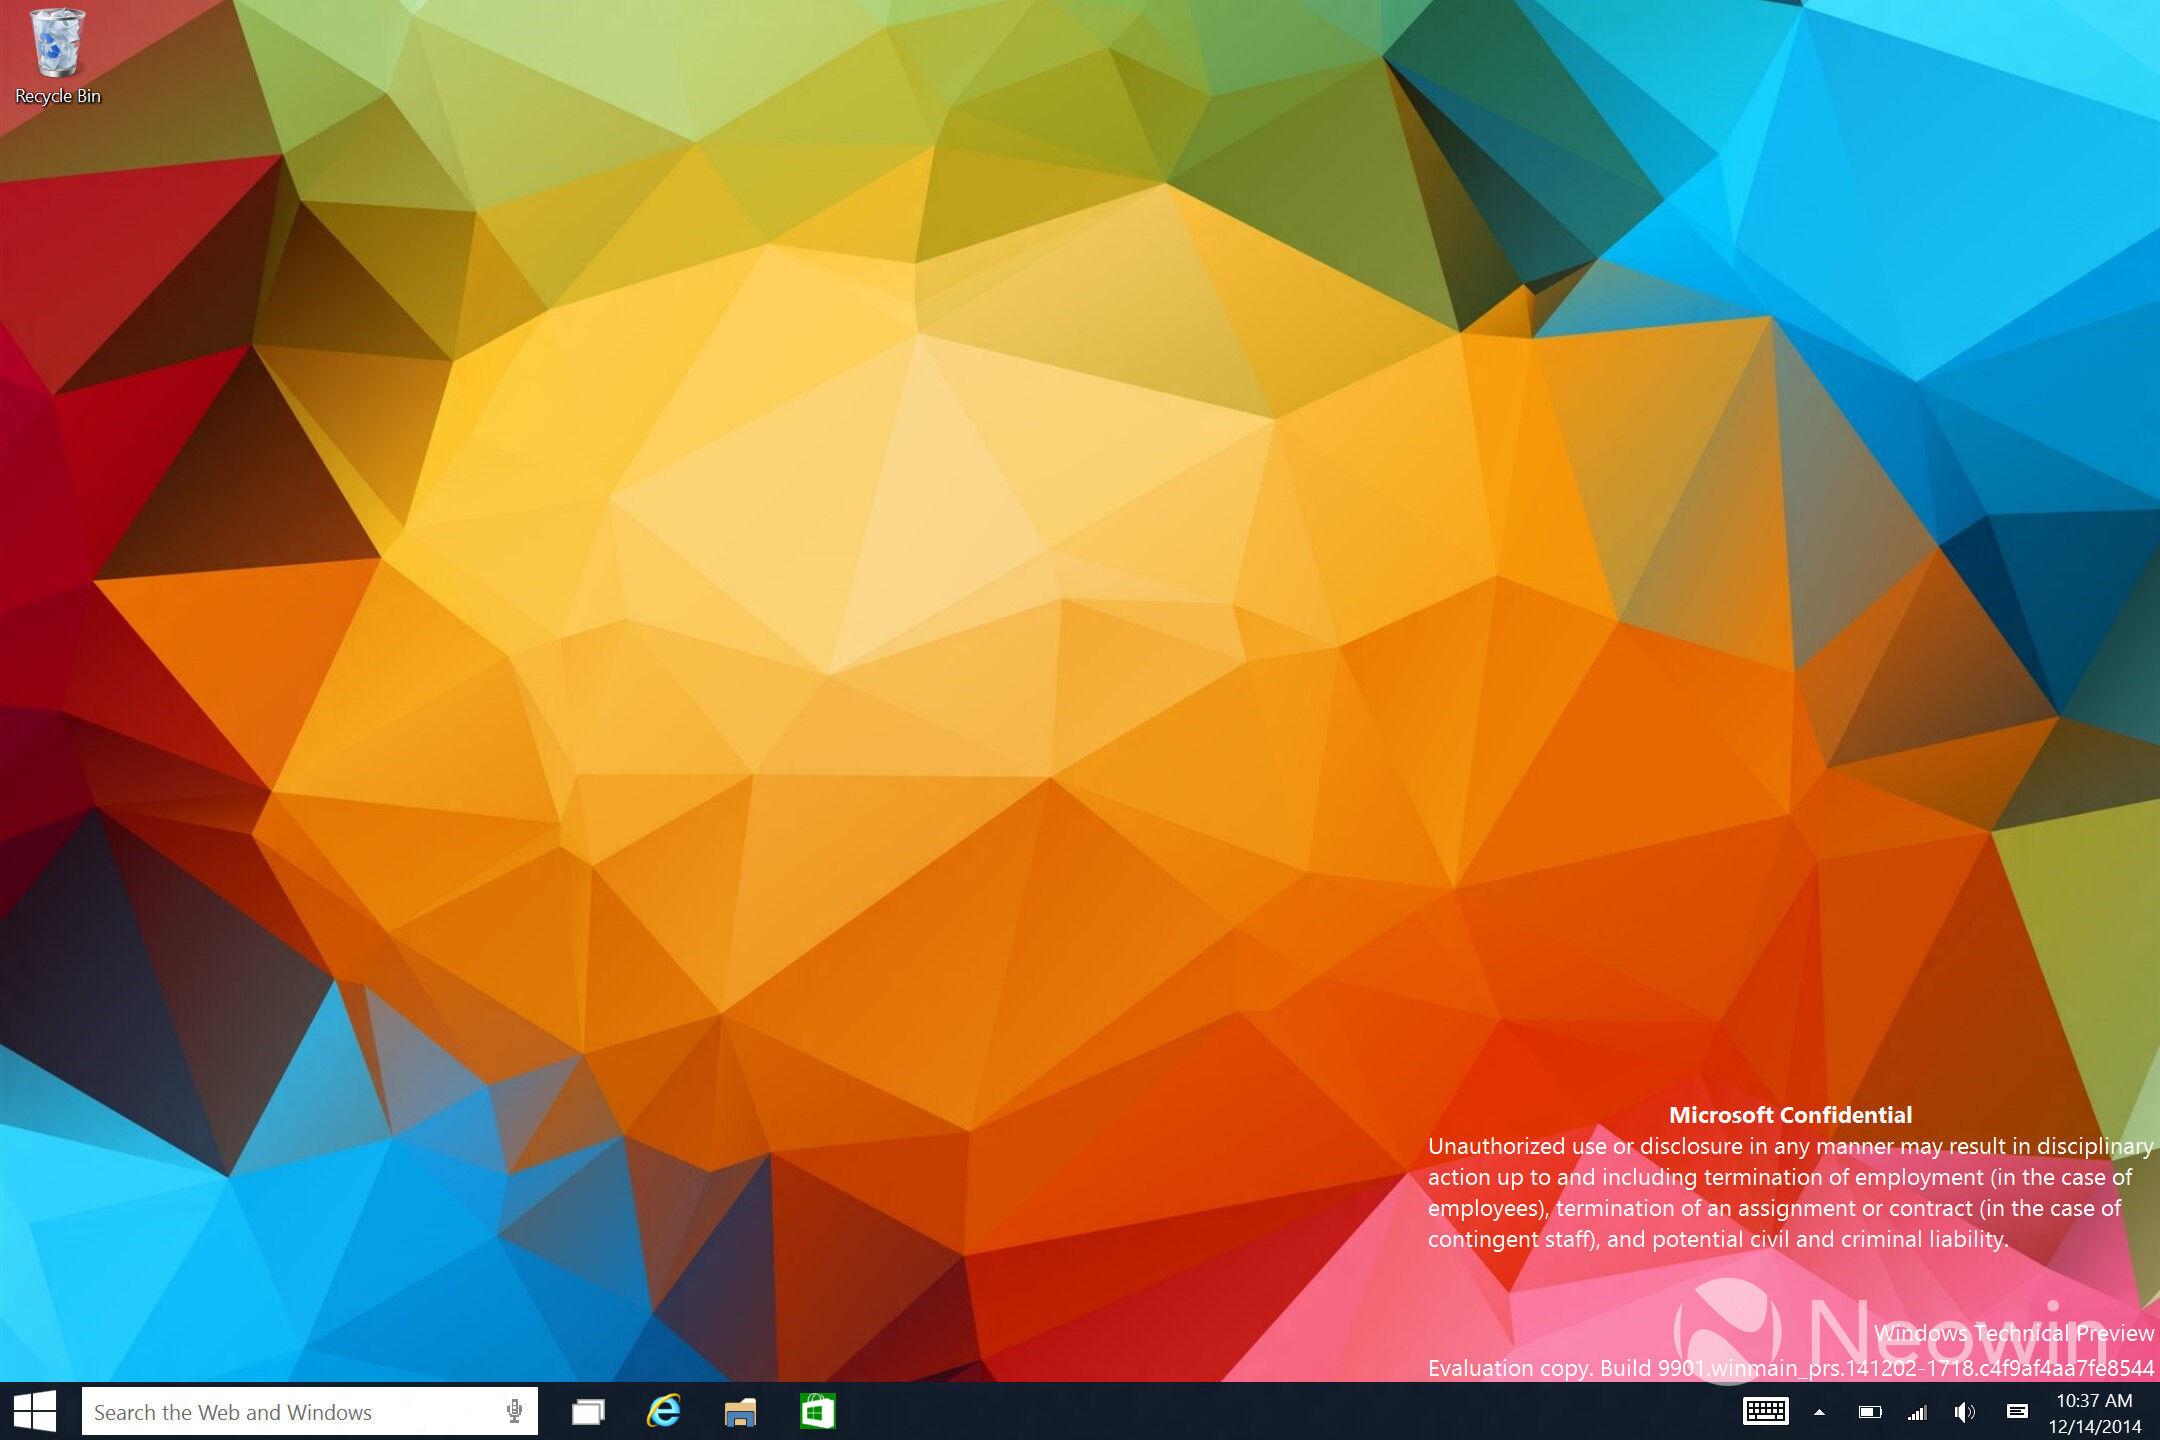 New UI design for Windows 10 build 9901 22